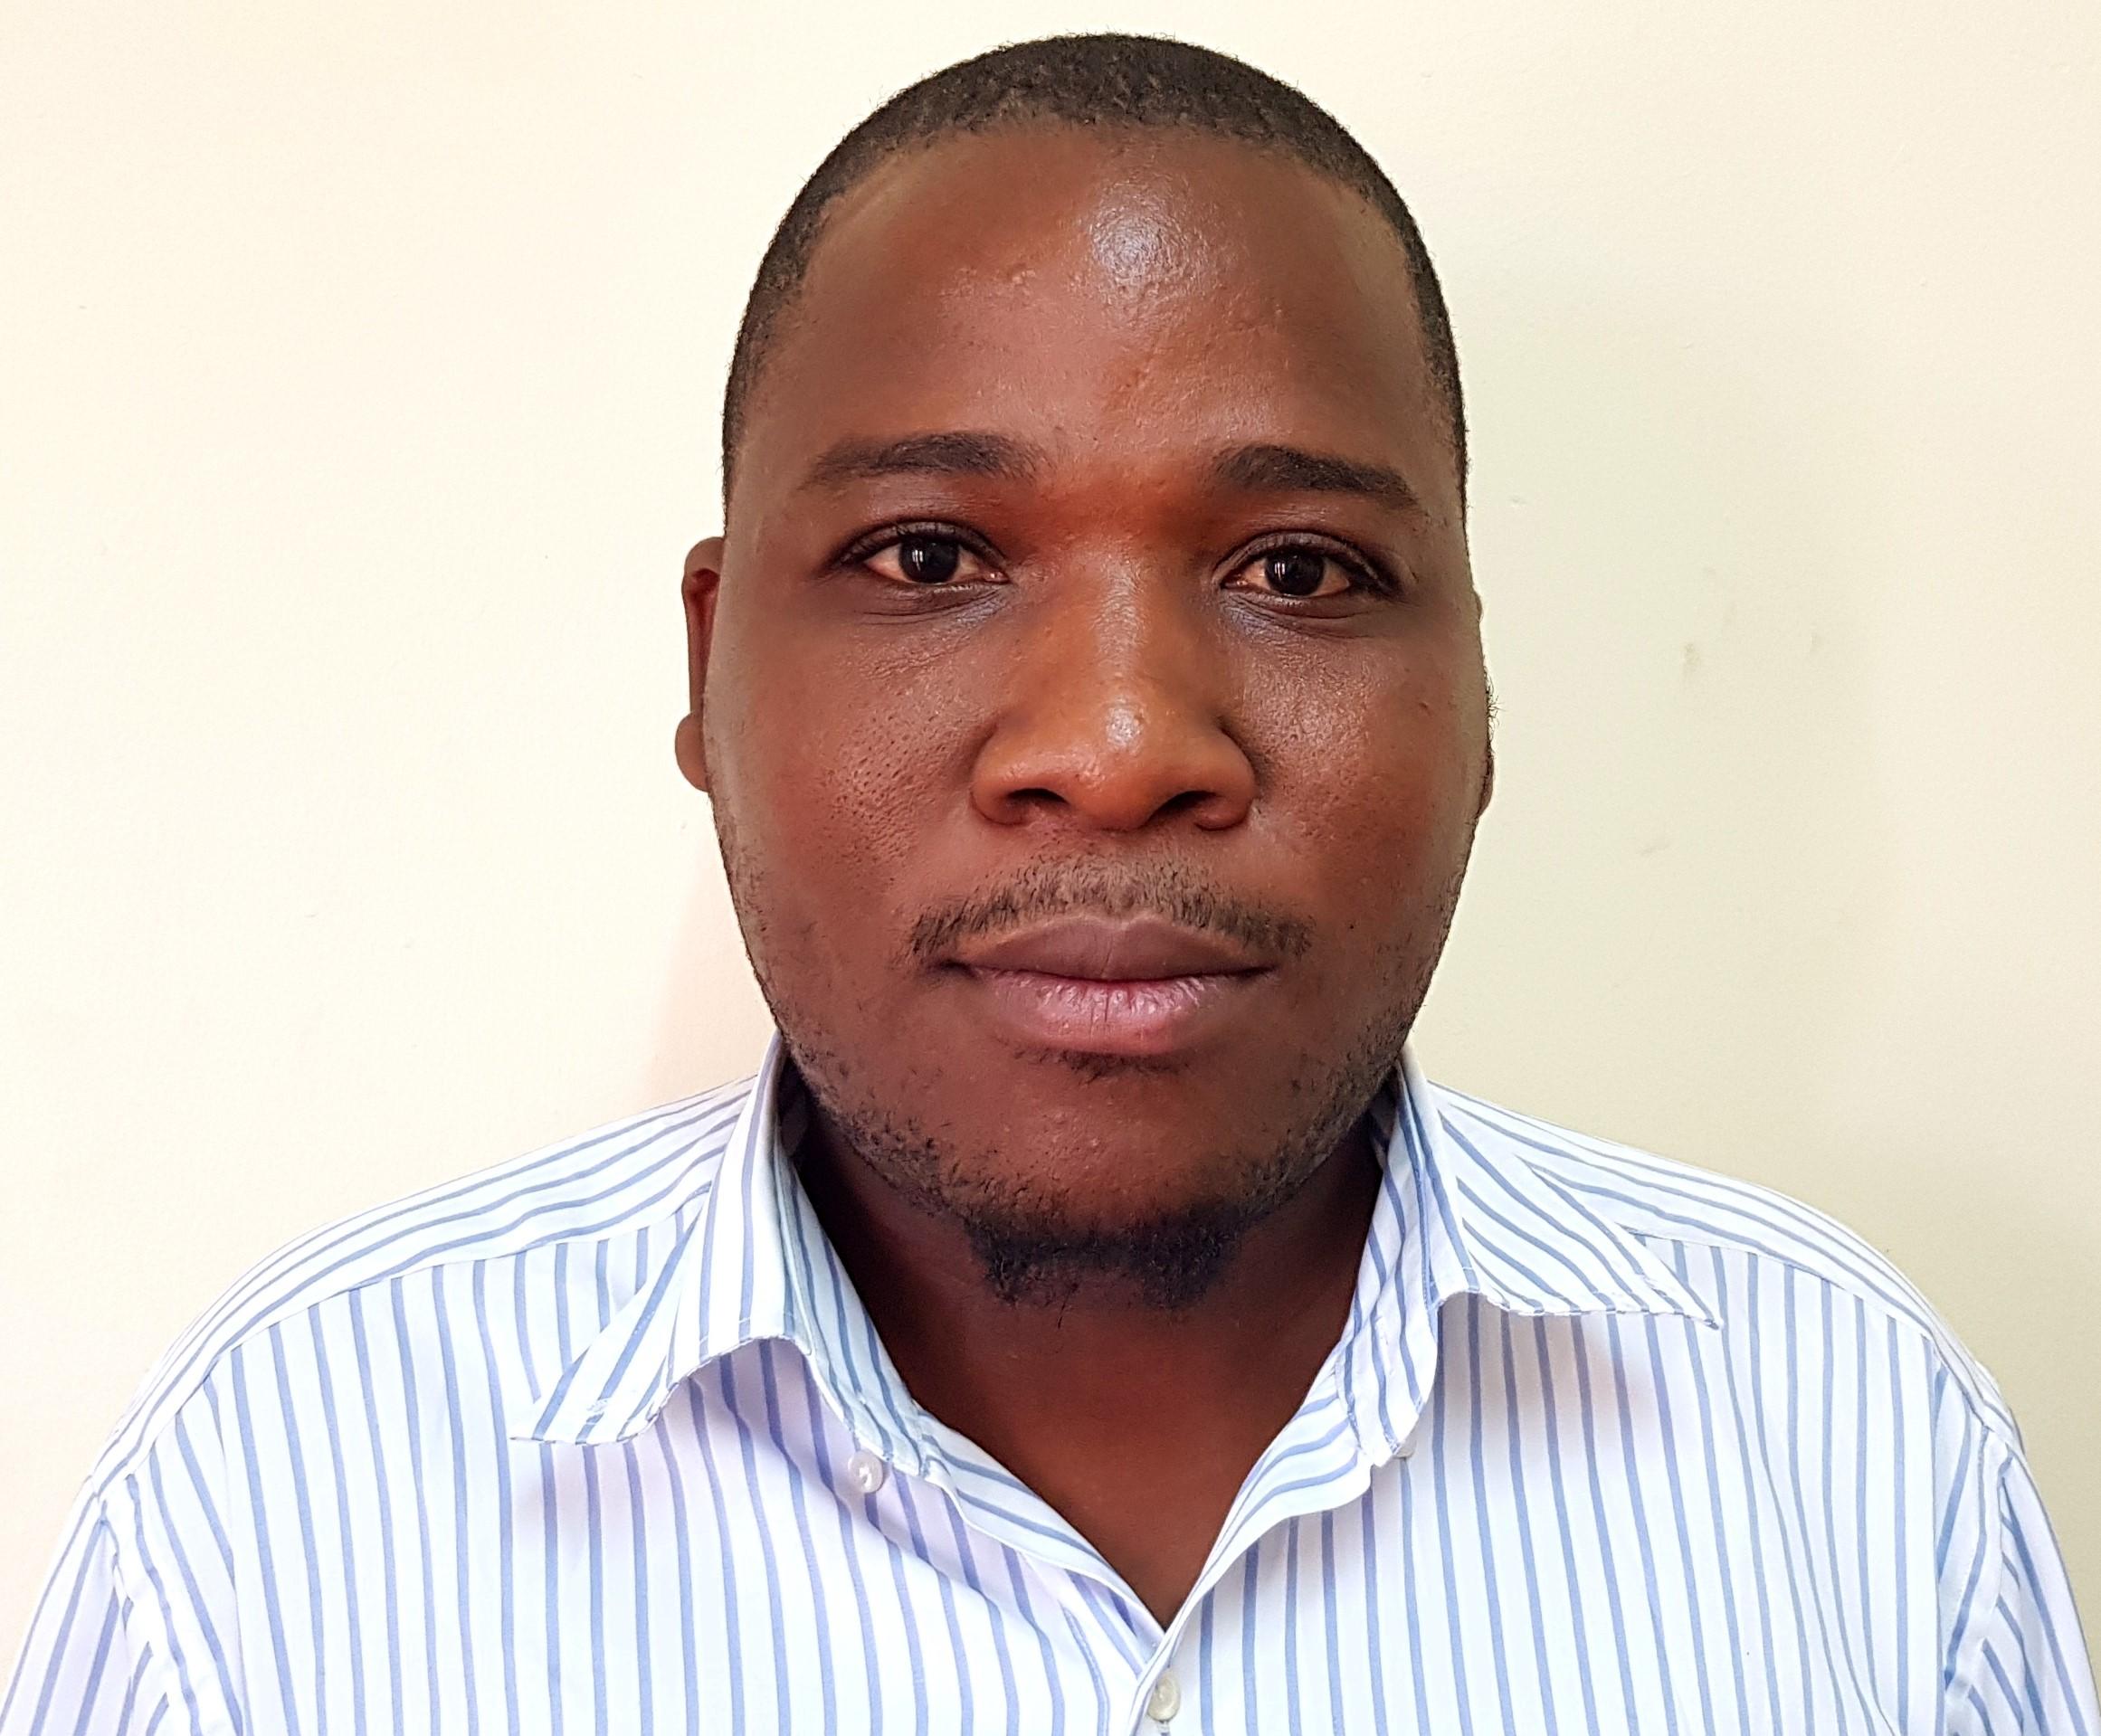 Emmanuel Salapa